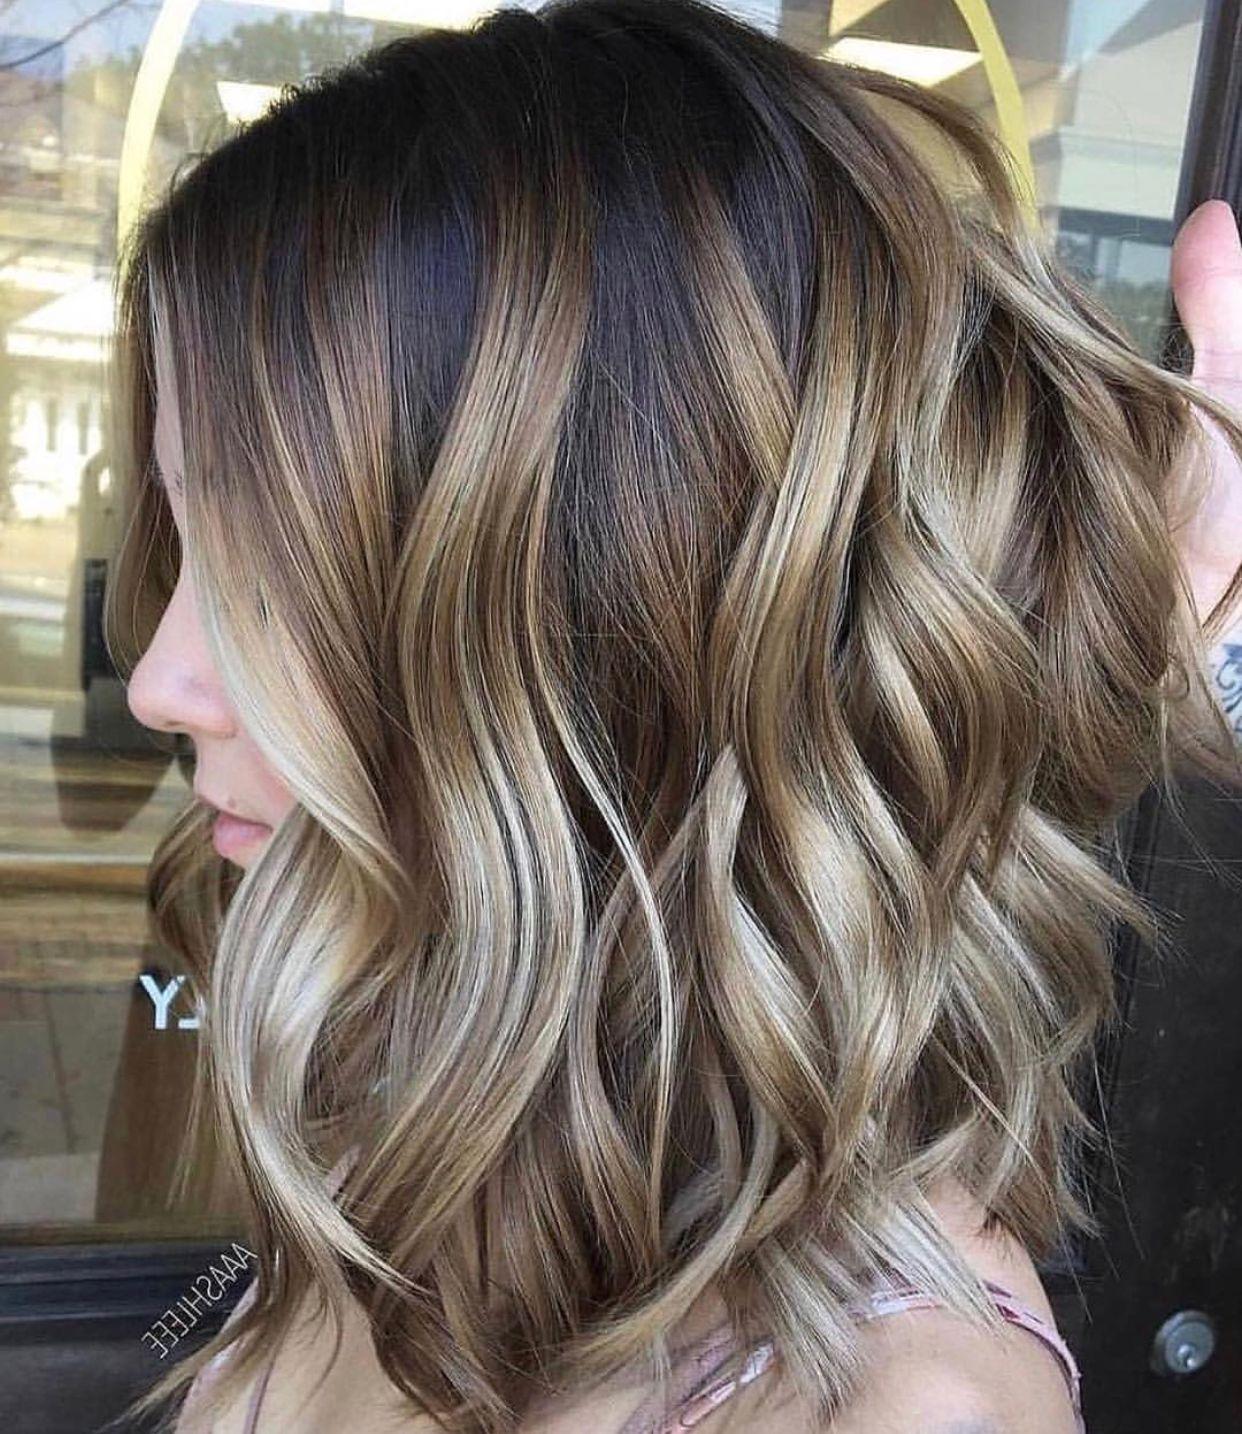 Hair styles hair styles pinterest hair balayage hair and hair